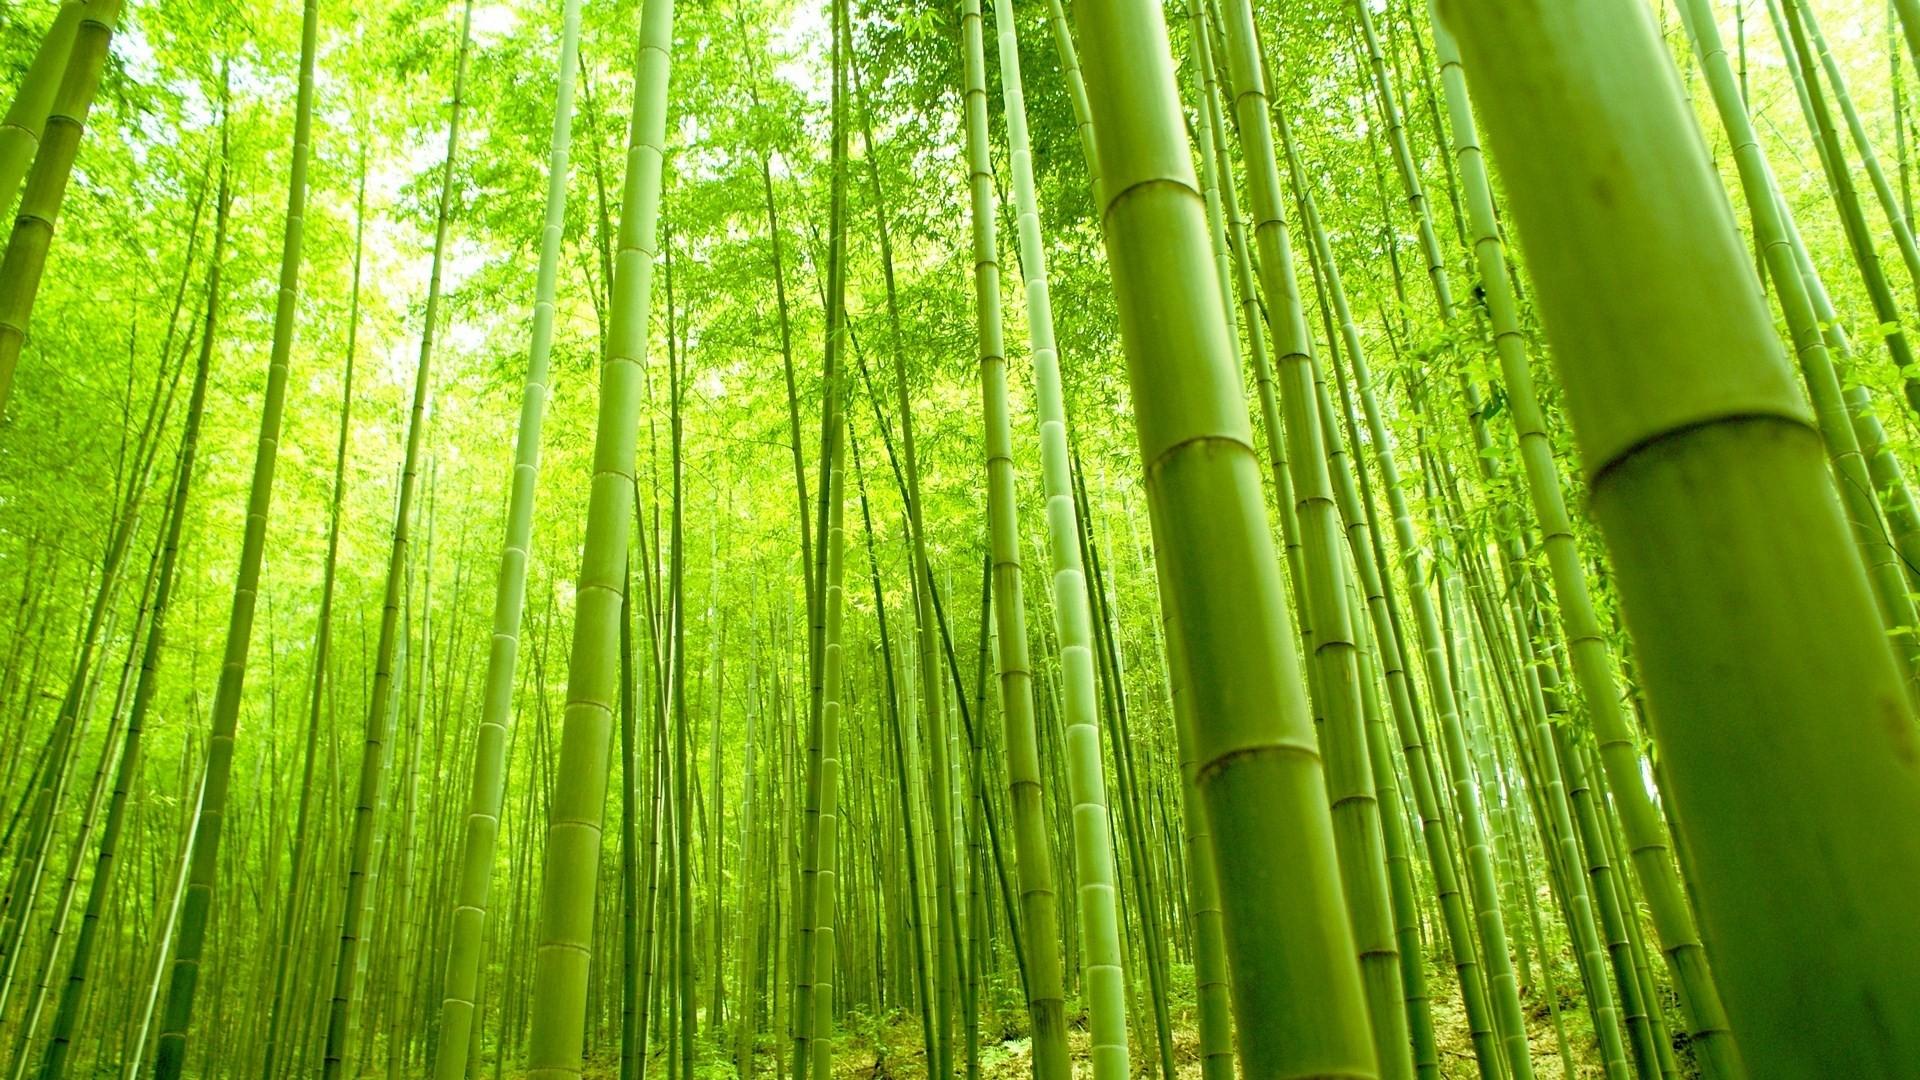 Bamboo hd wallpaper download